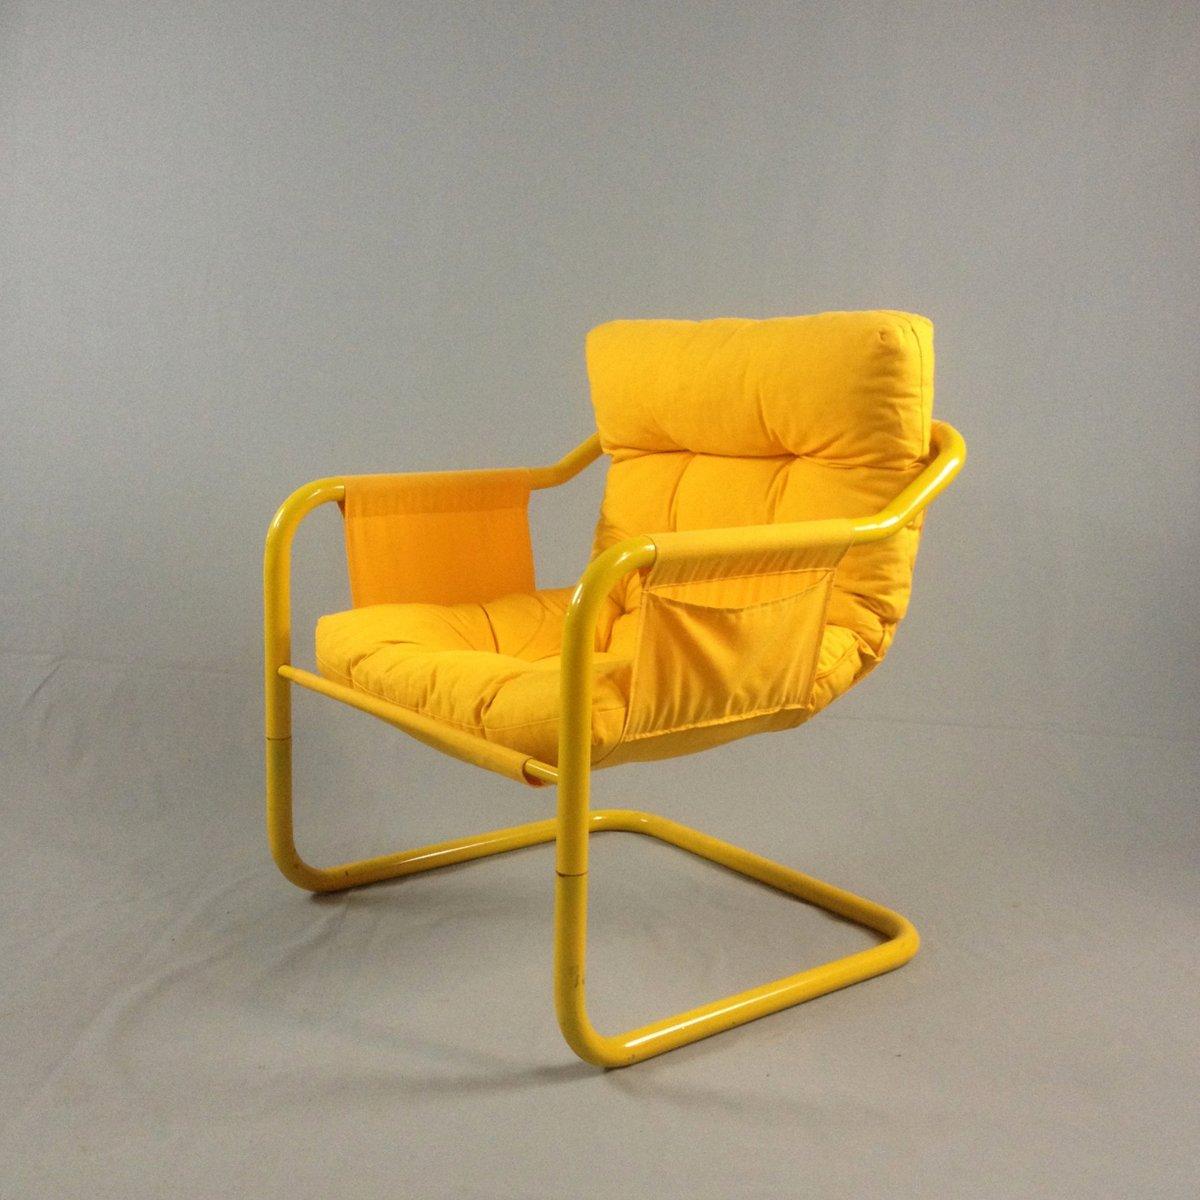 gelbe st hle mit rohrrahmen 1980er 2er set bei pamono kaufen. Black Bedroom Furniture Sets. Home Design Ideas